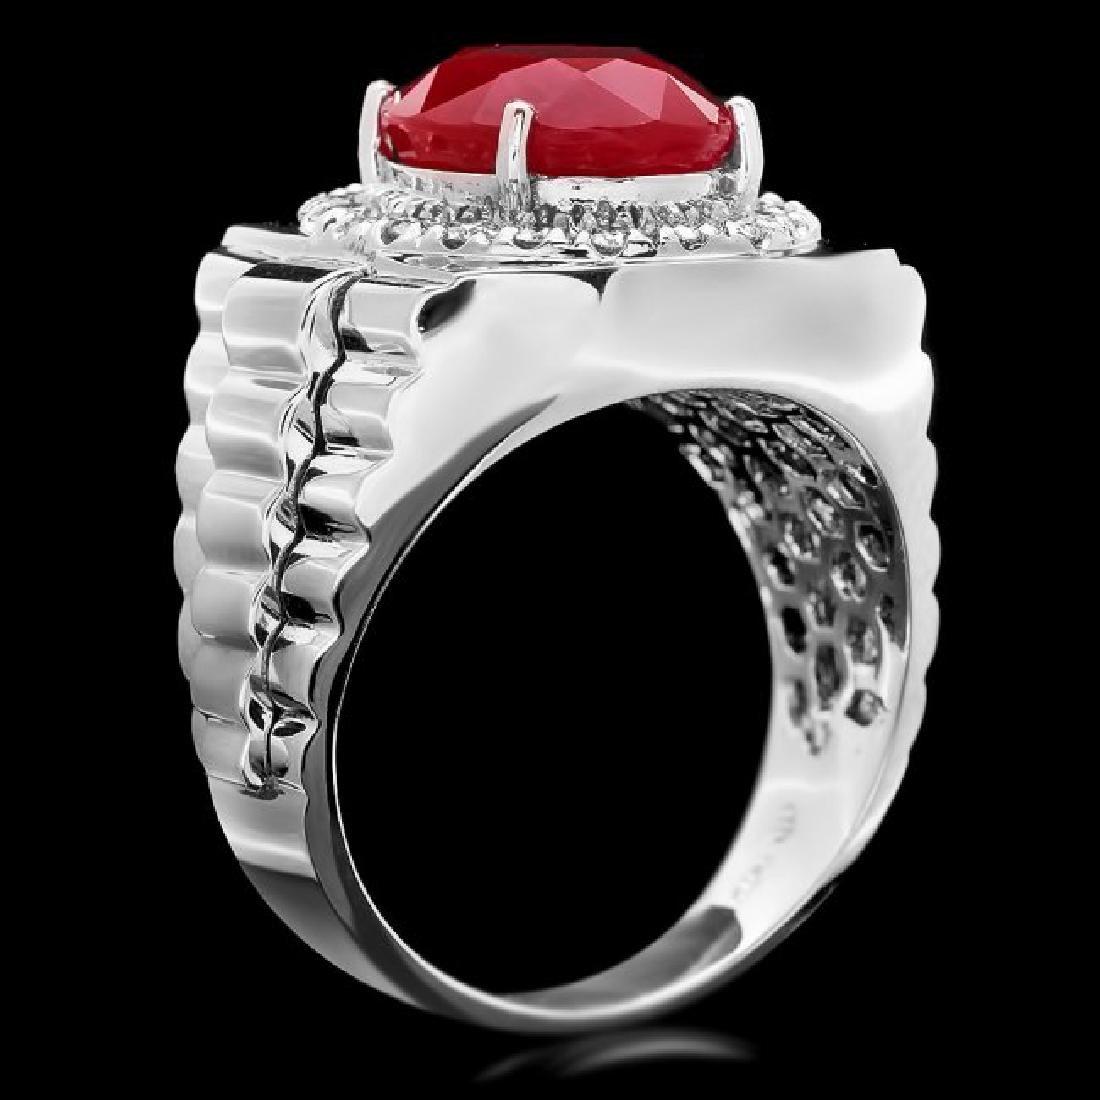 14k White Gold 10.00ct Ruby 0.80ct Diamond Ring - 3